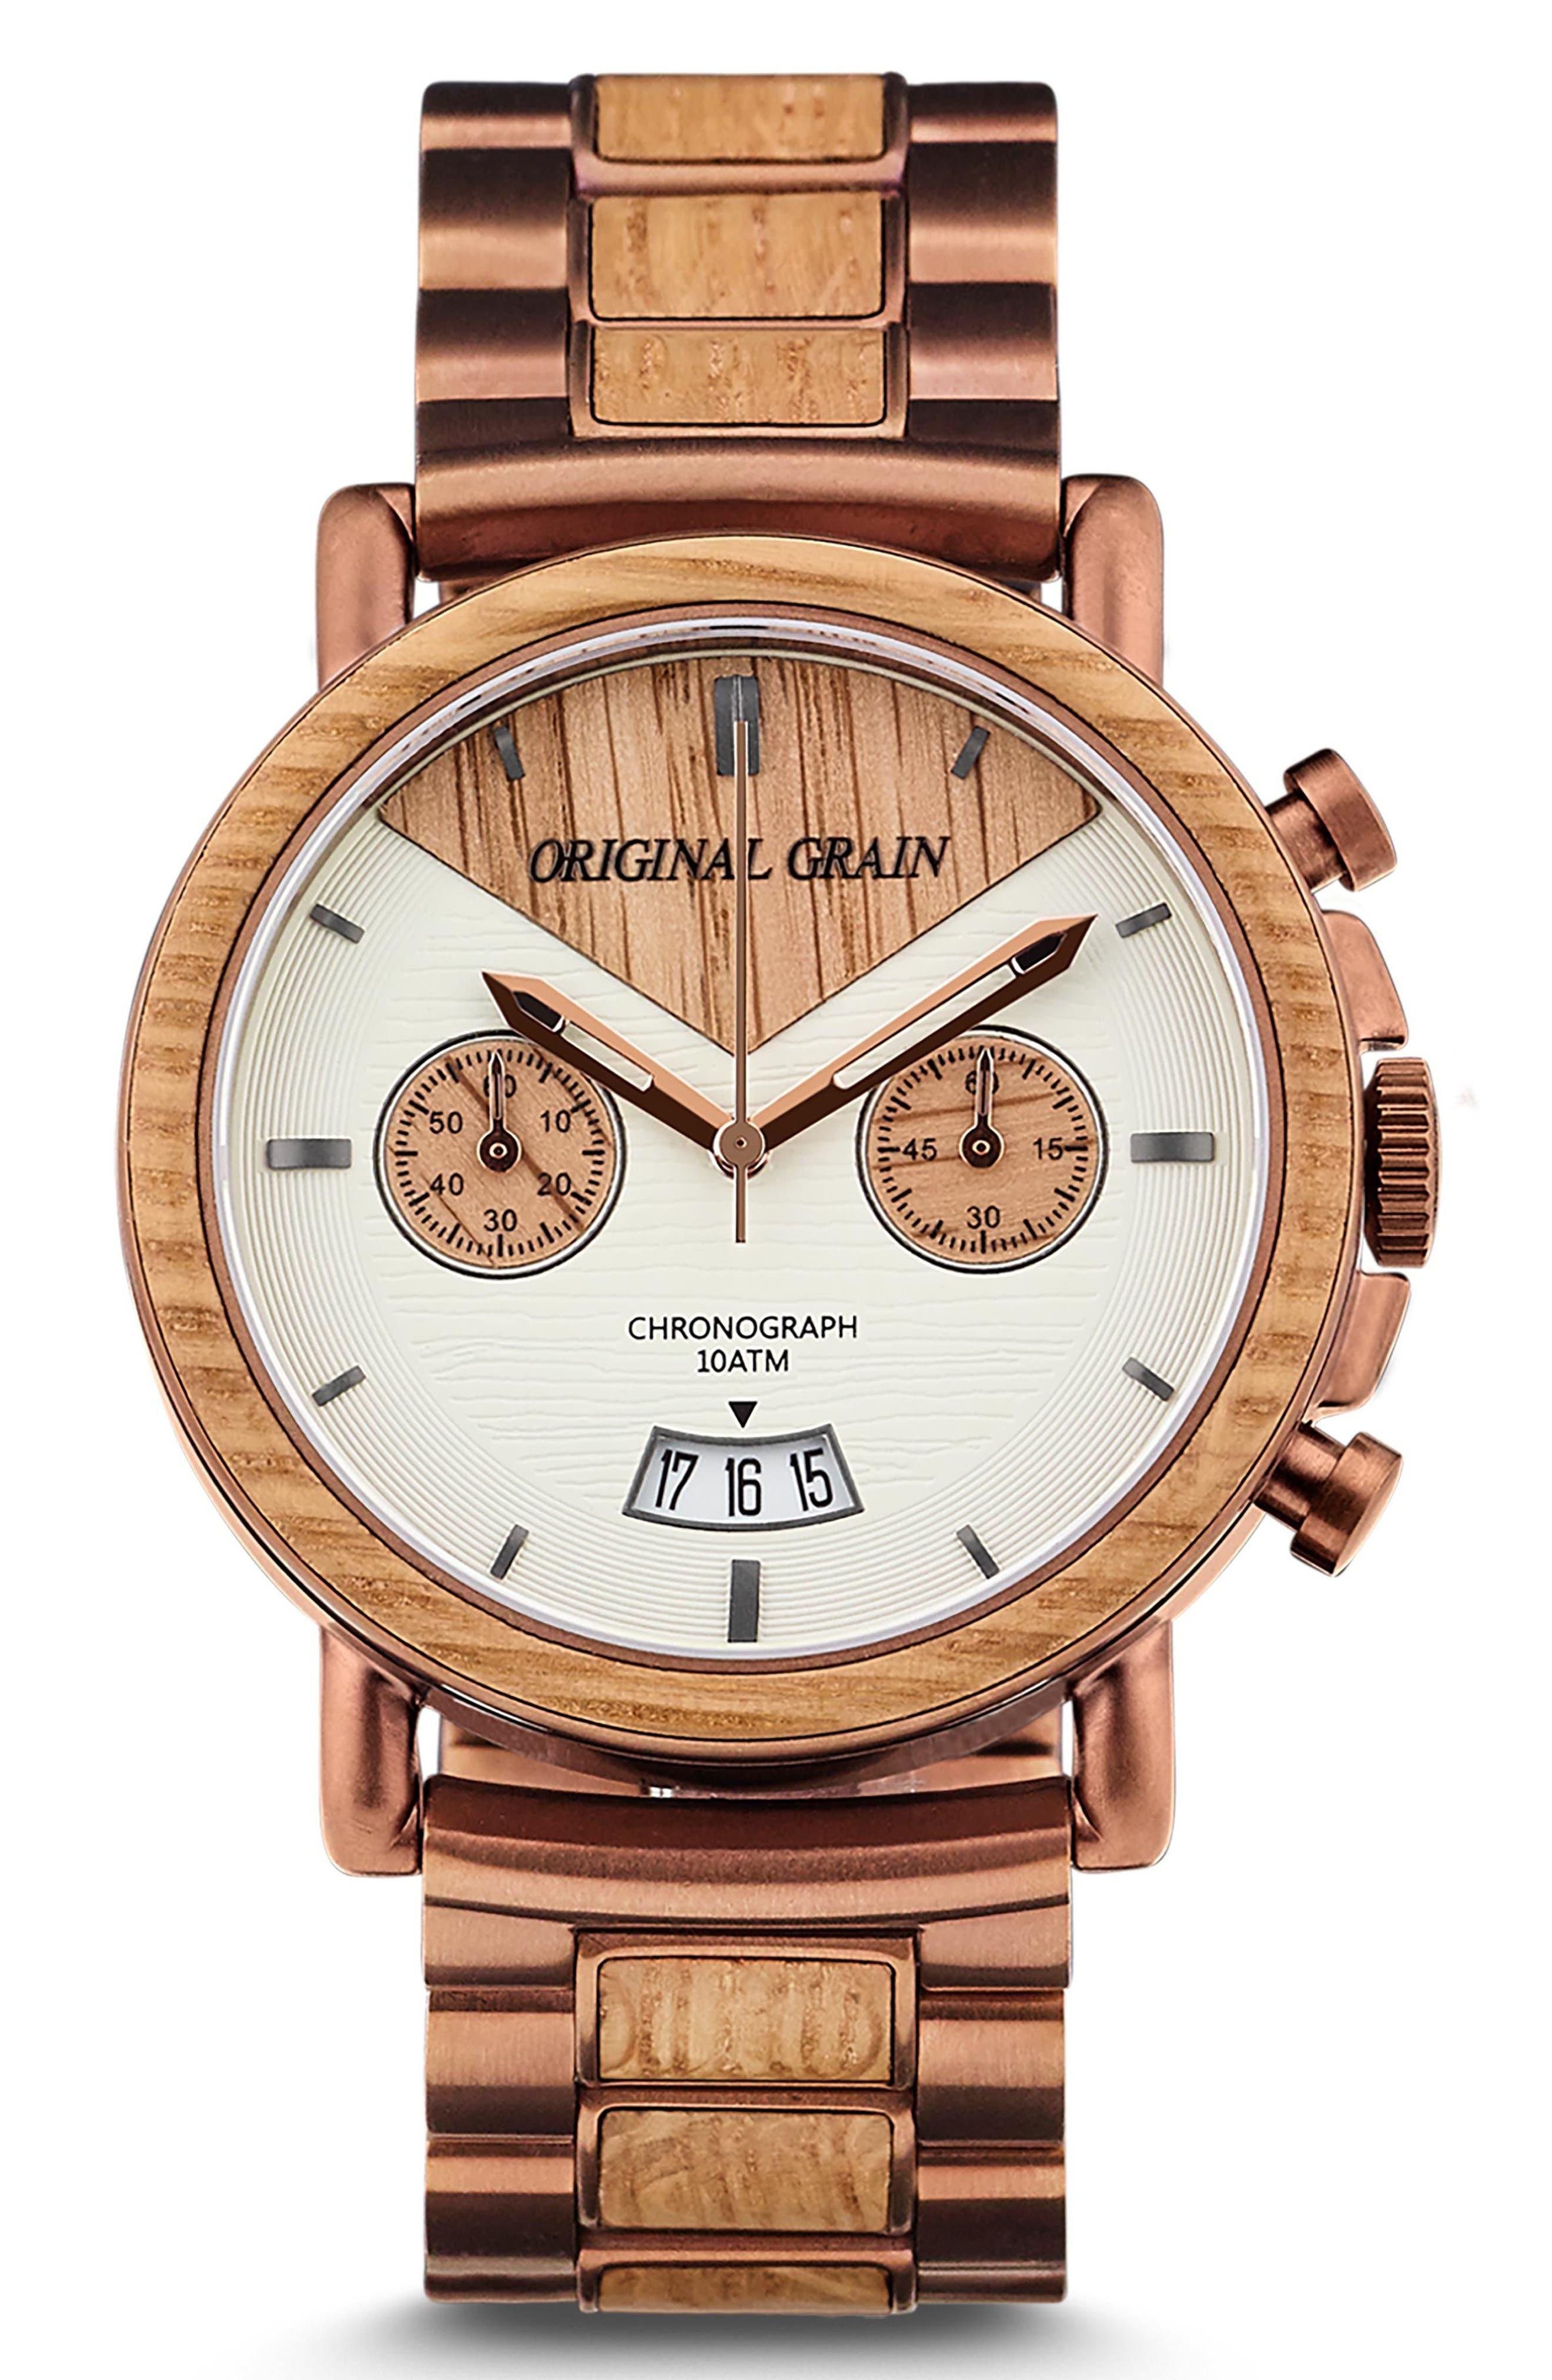 Main Image - Original Grain Alterra Chronograph Bracelet Watch, 44mm